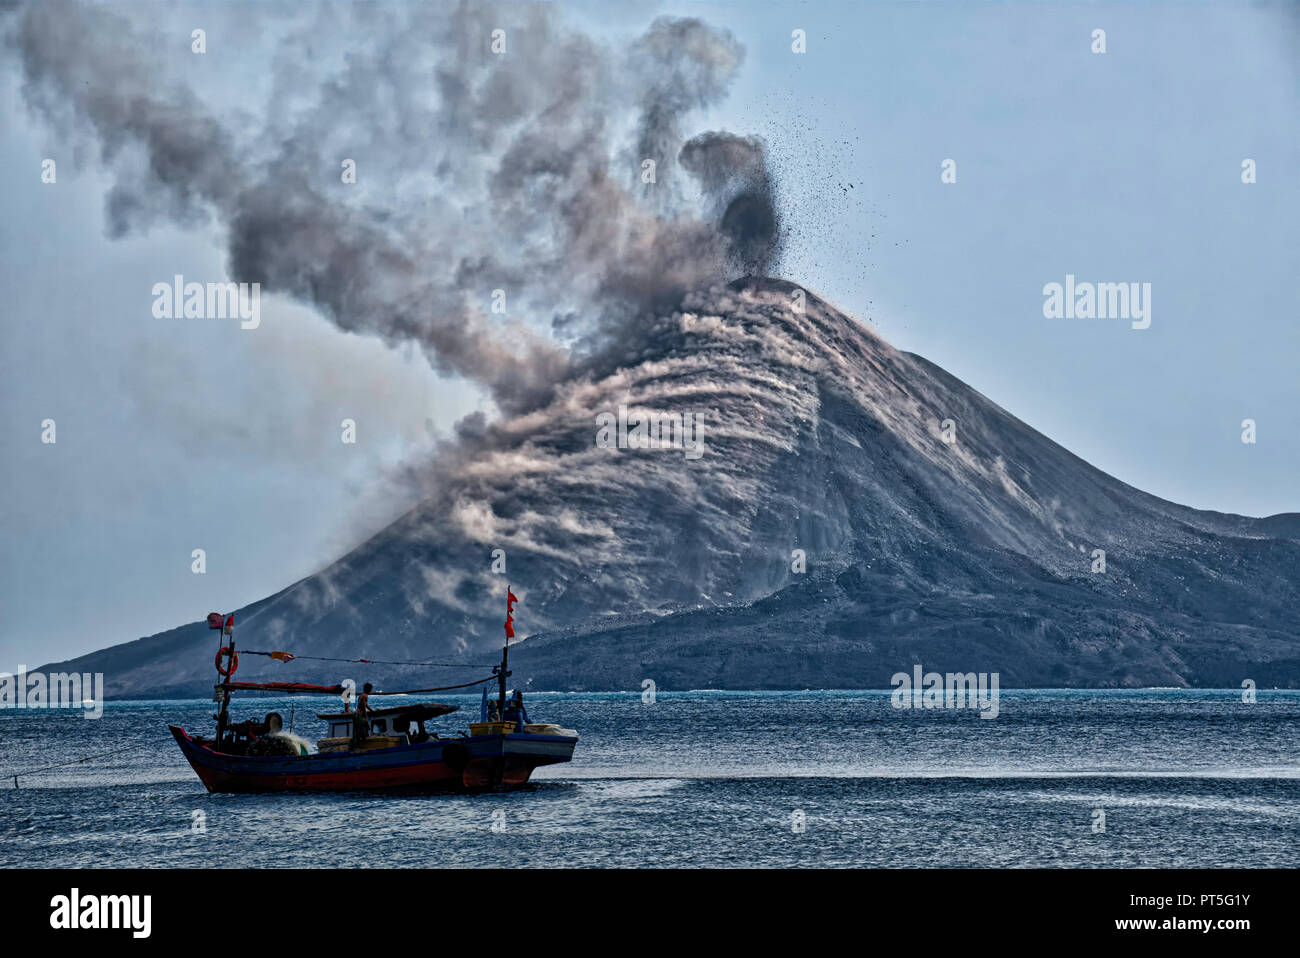 The Krakatoa island (also known as 'Krakatau') is situated near the Indonesian island of Rakata in western Indonesia, in the Sunda Strait between Java - Stock Image